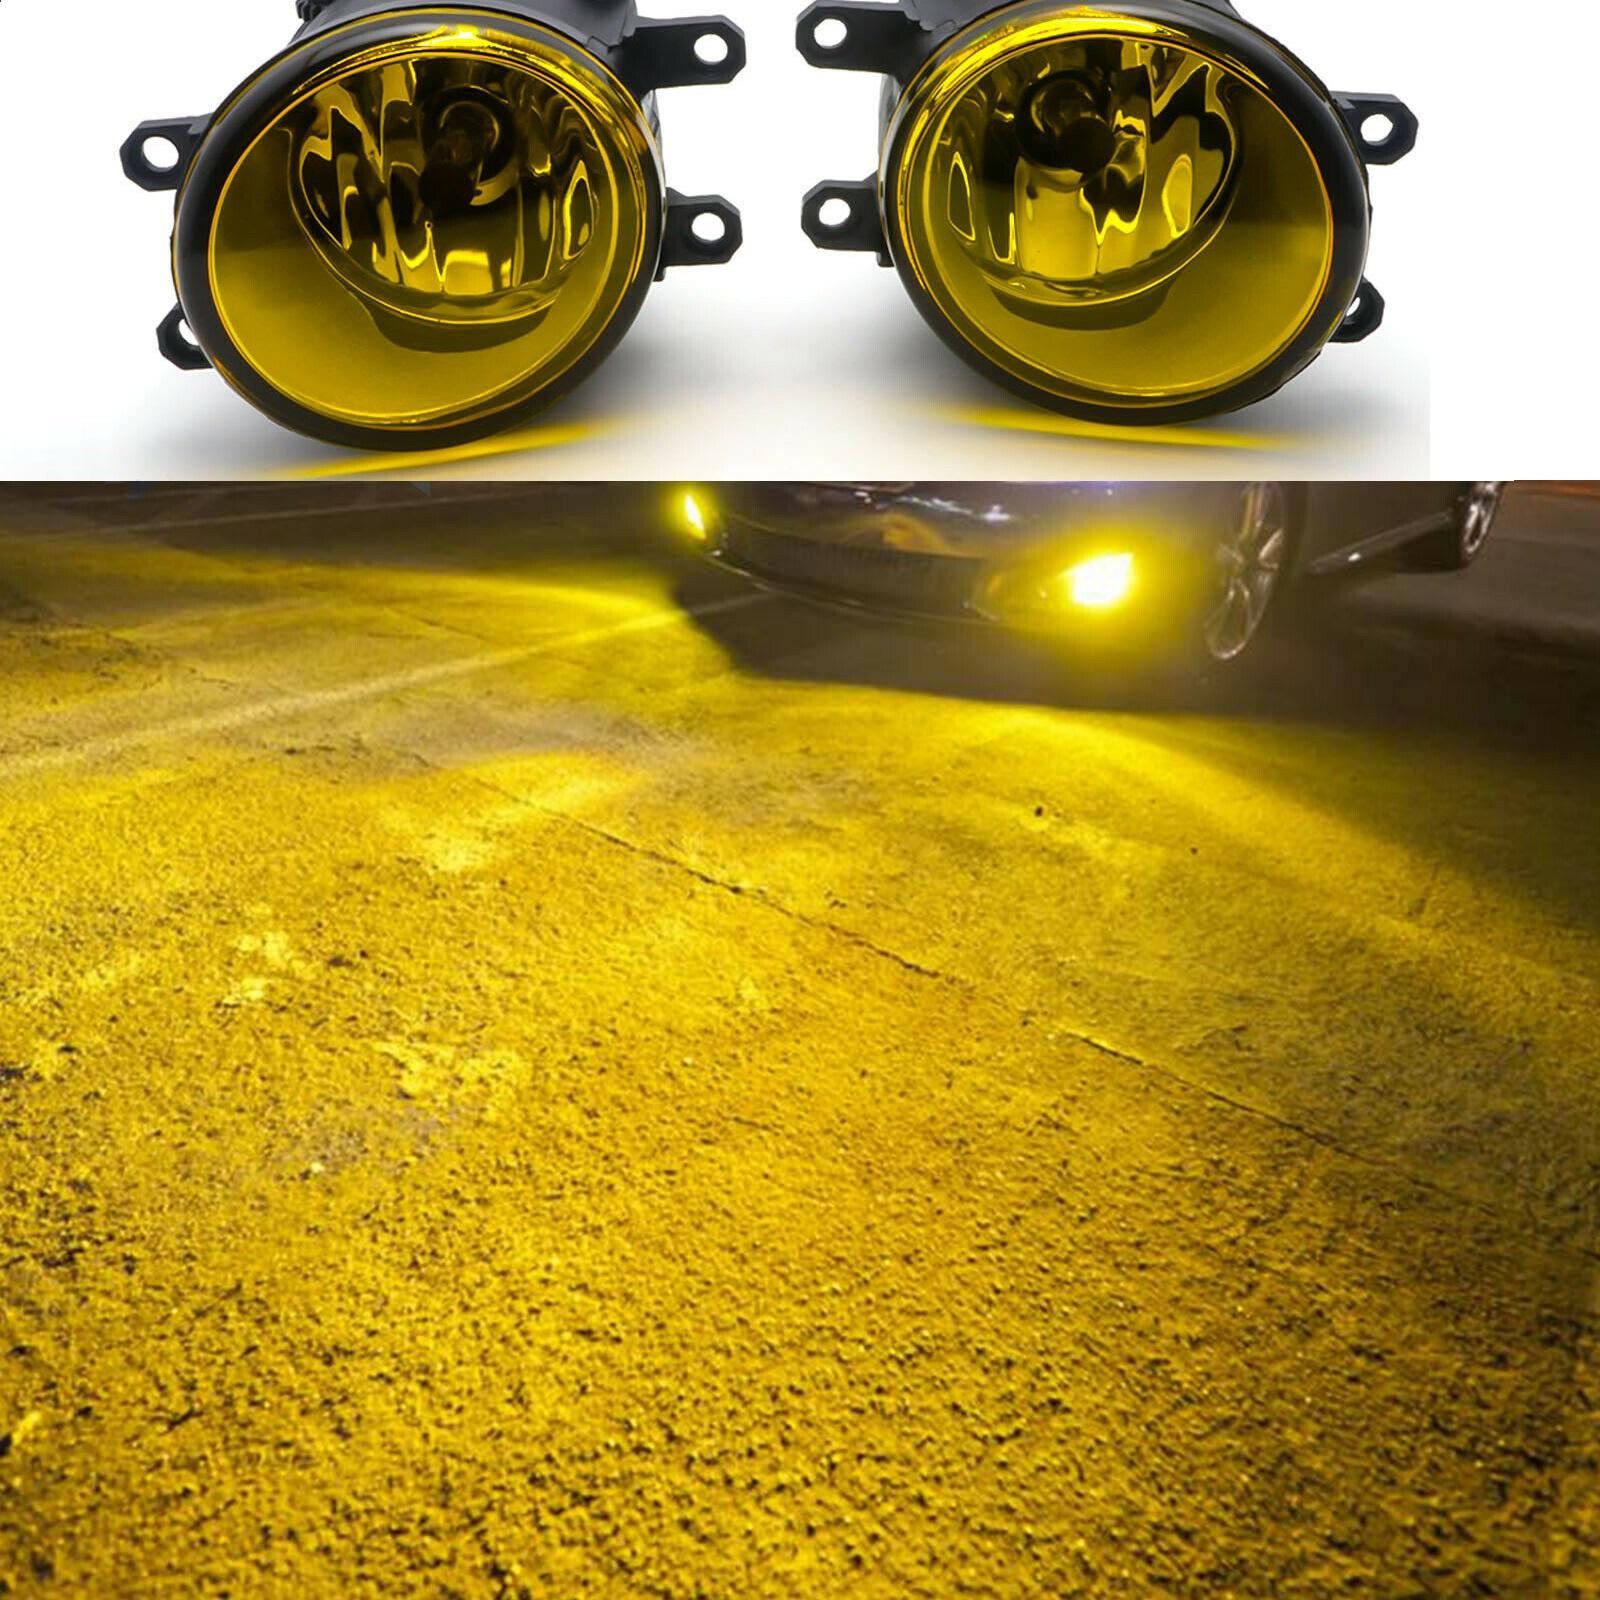 Suitable For Crown Reiz Corolla Rav4 Highlander Vios Camry Front Fog Lamp Left And Right 8121006071 812200d042 Yellow light